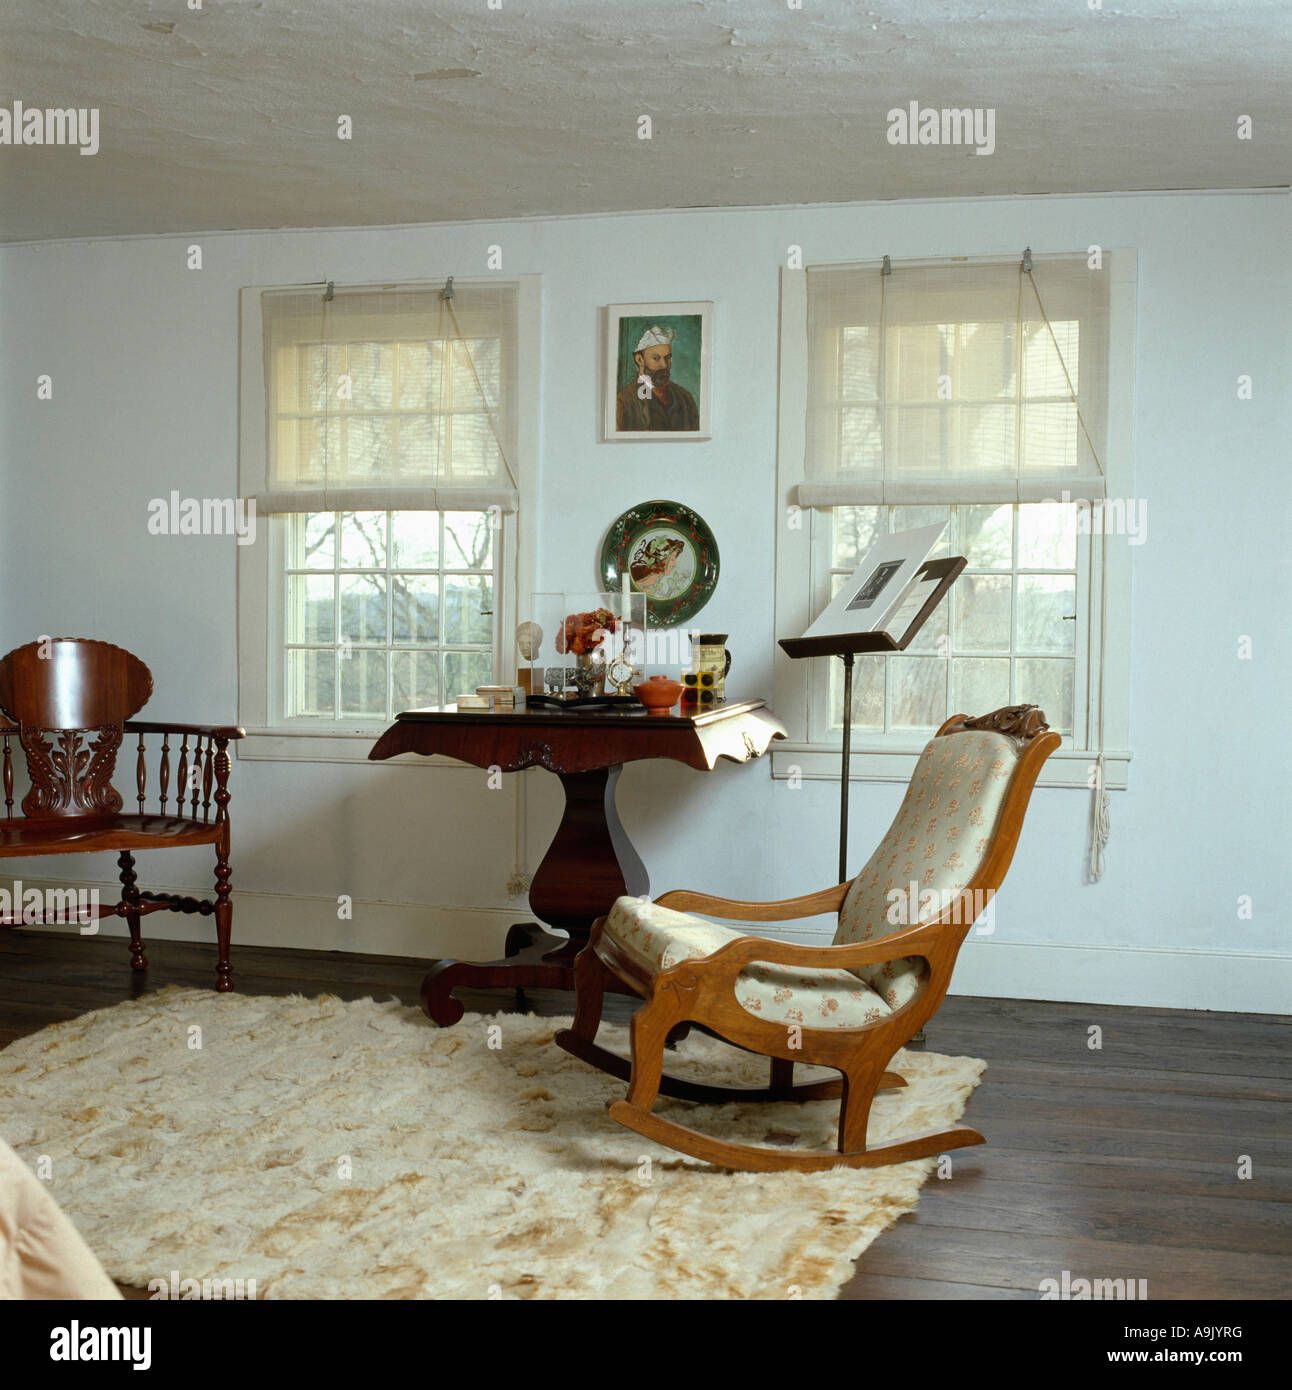 Cream Ponyskin Rug On Dark Wood Floor In White Bedroom With Rocking